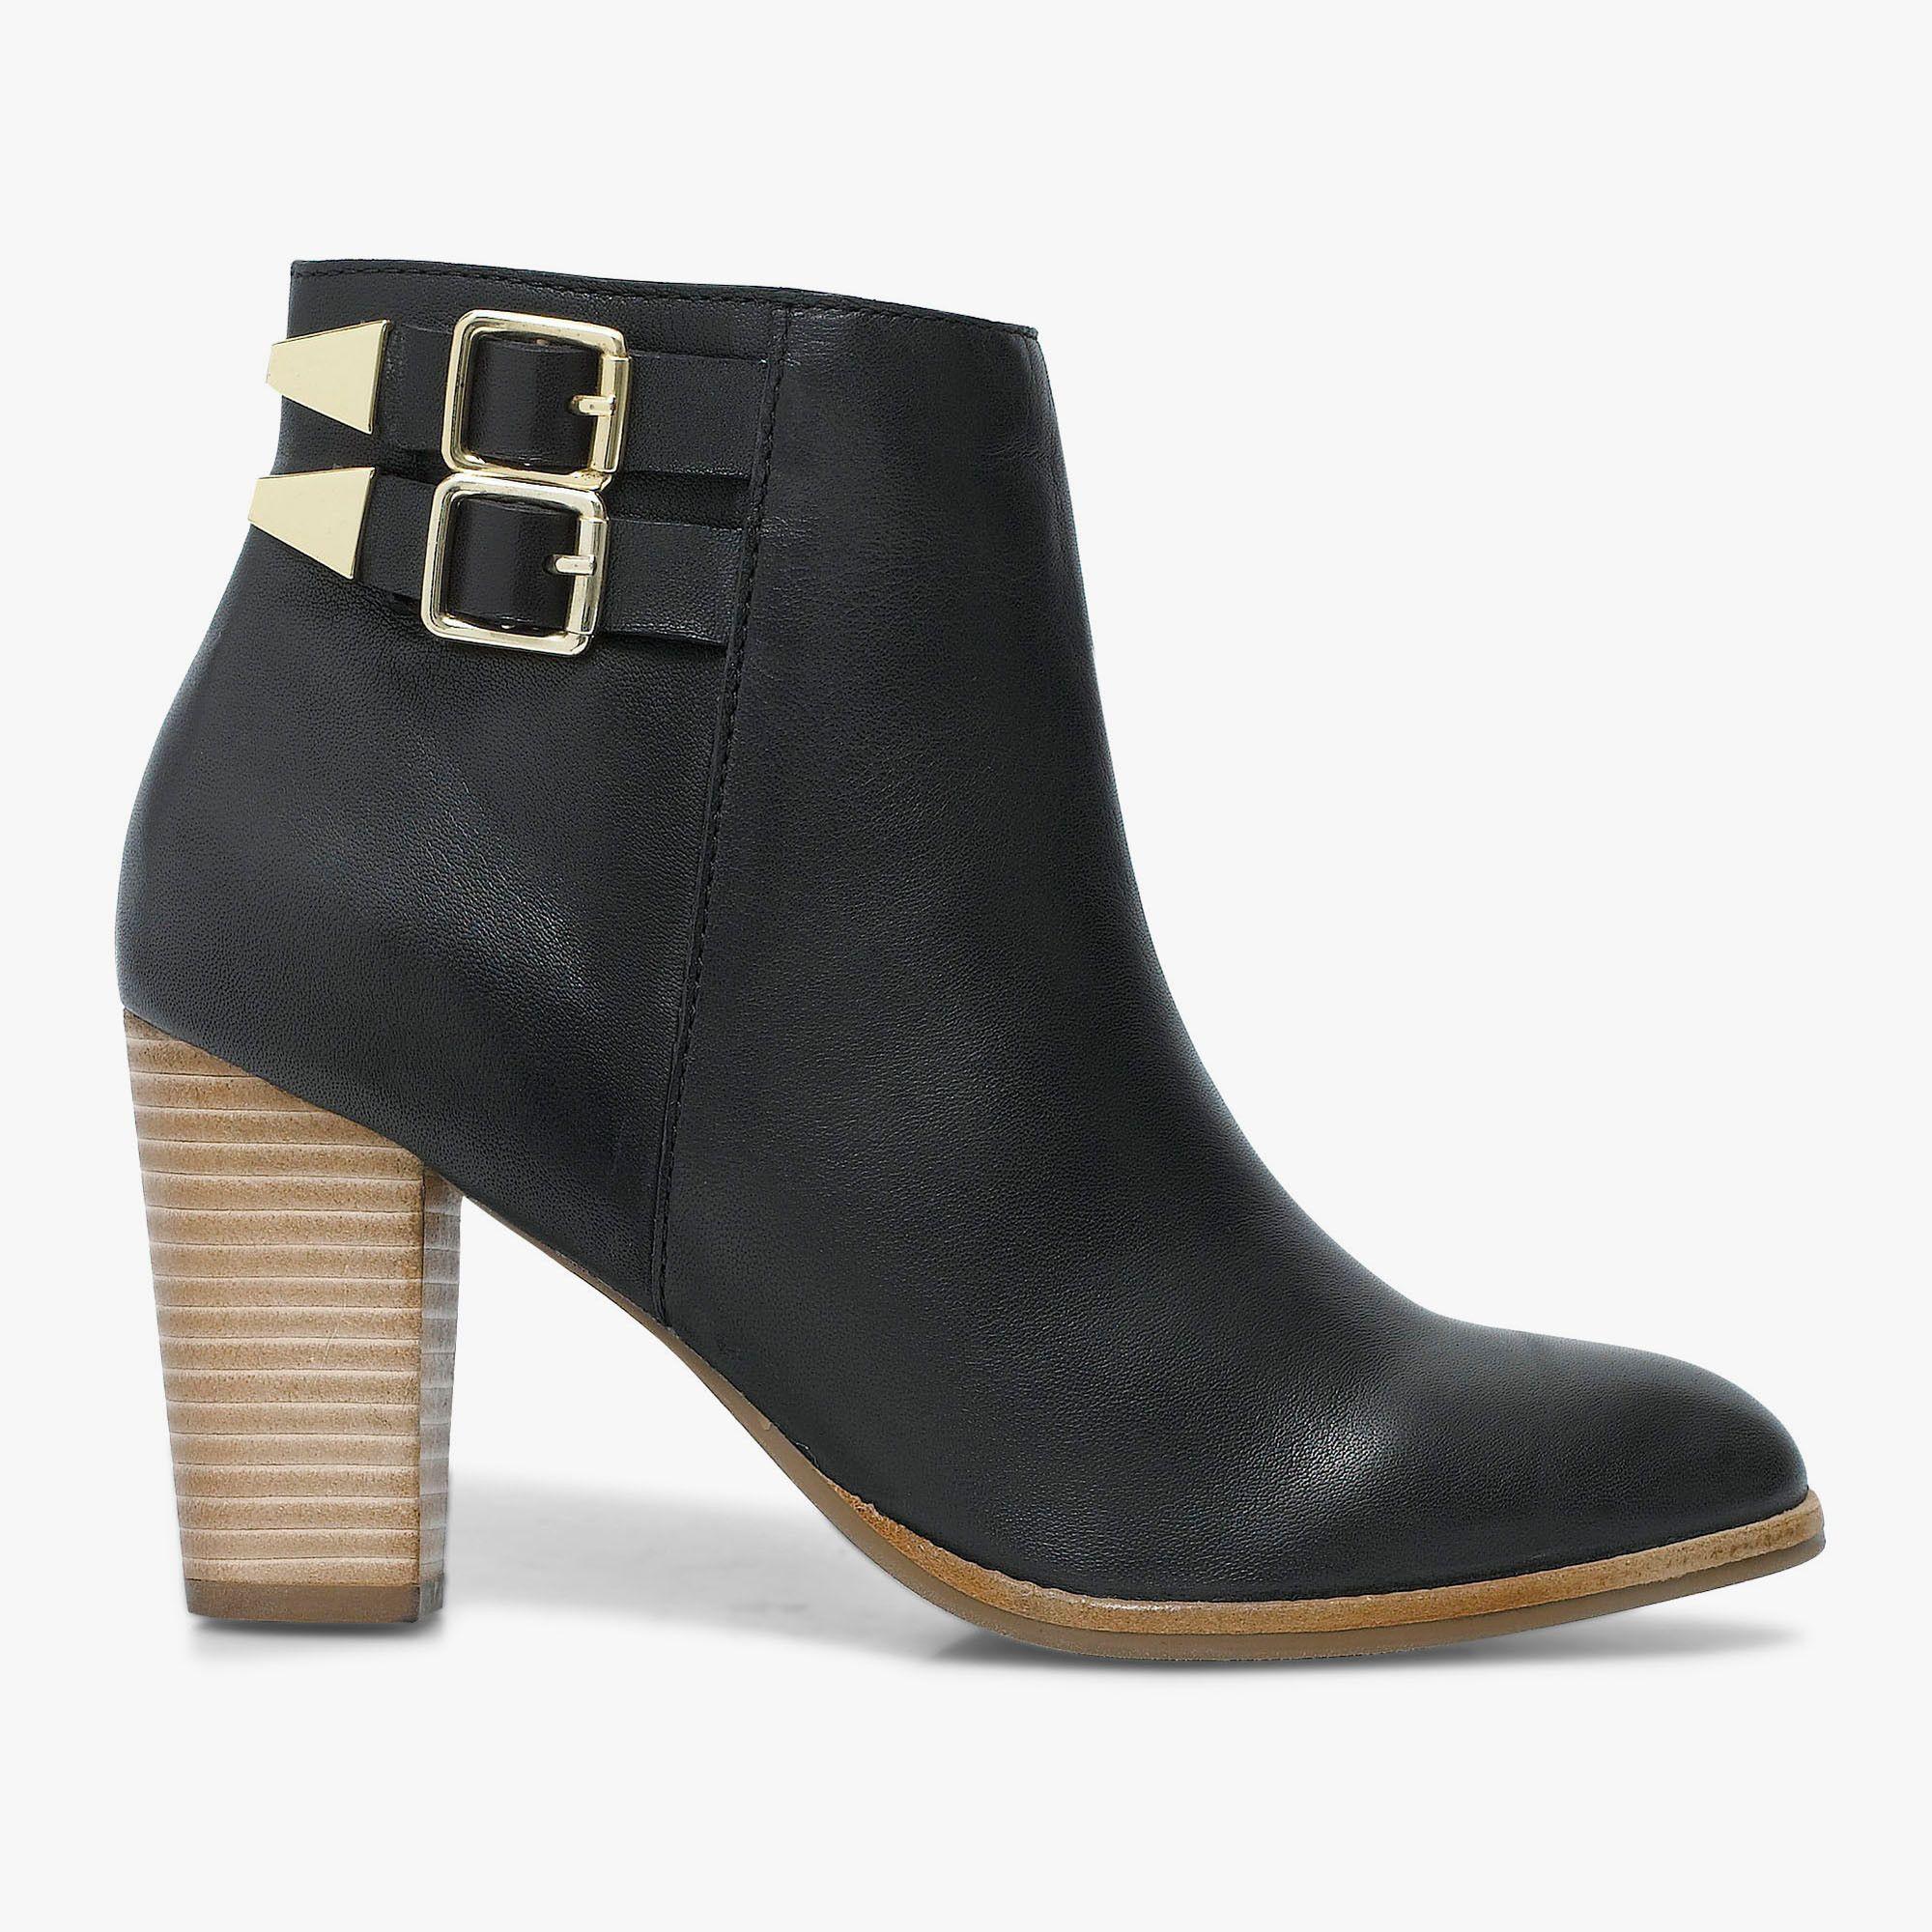 boots talon femme | clothing + such. | pinterest | catalog